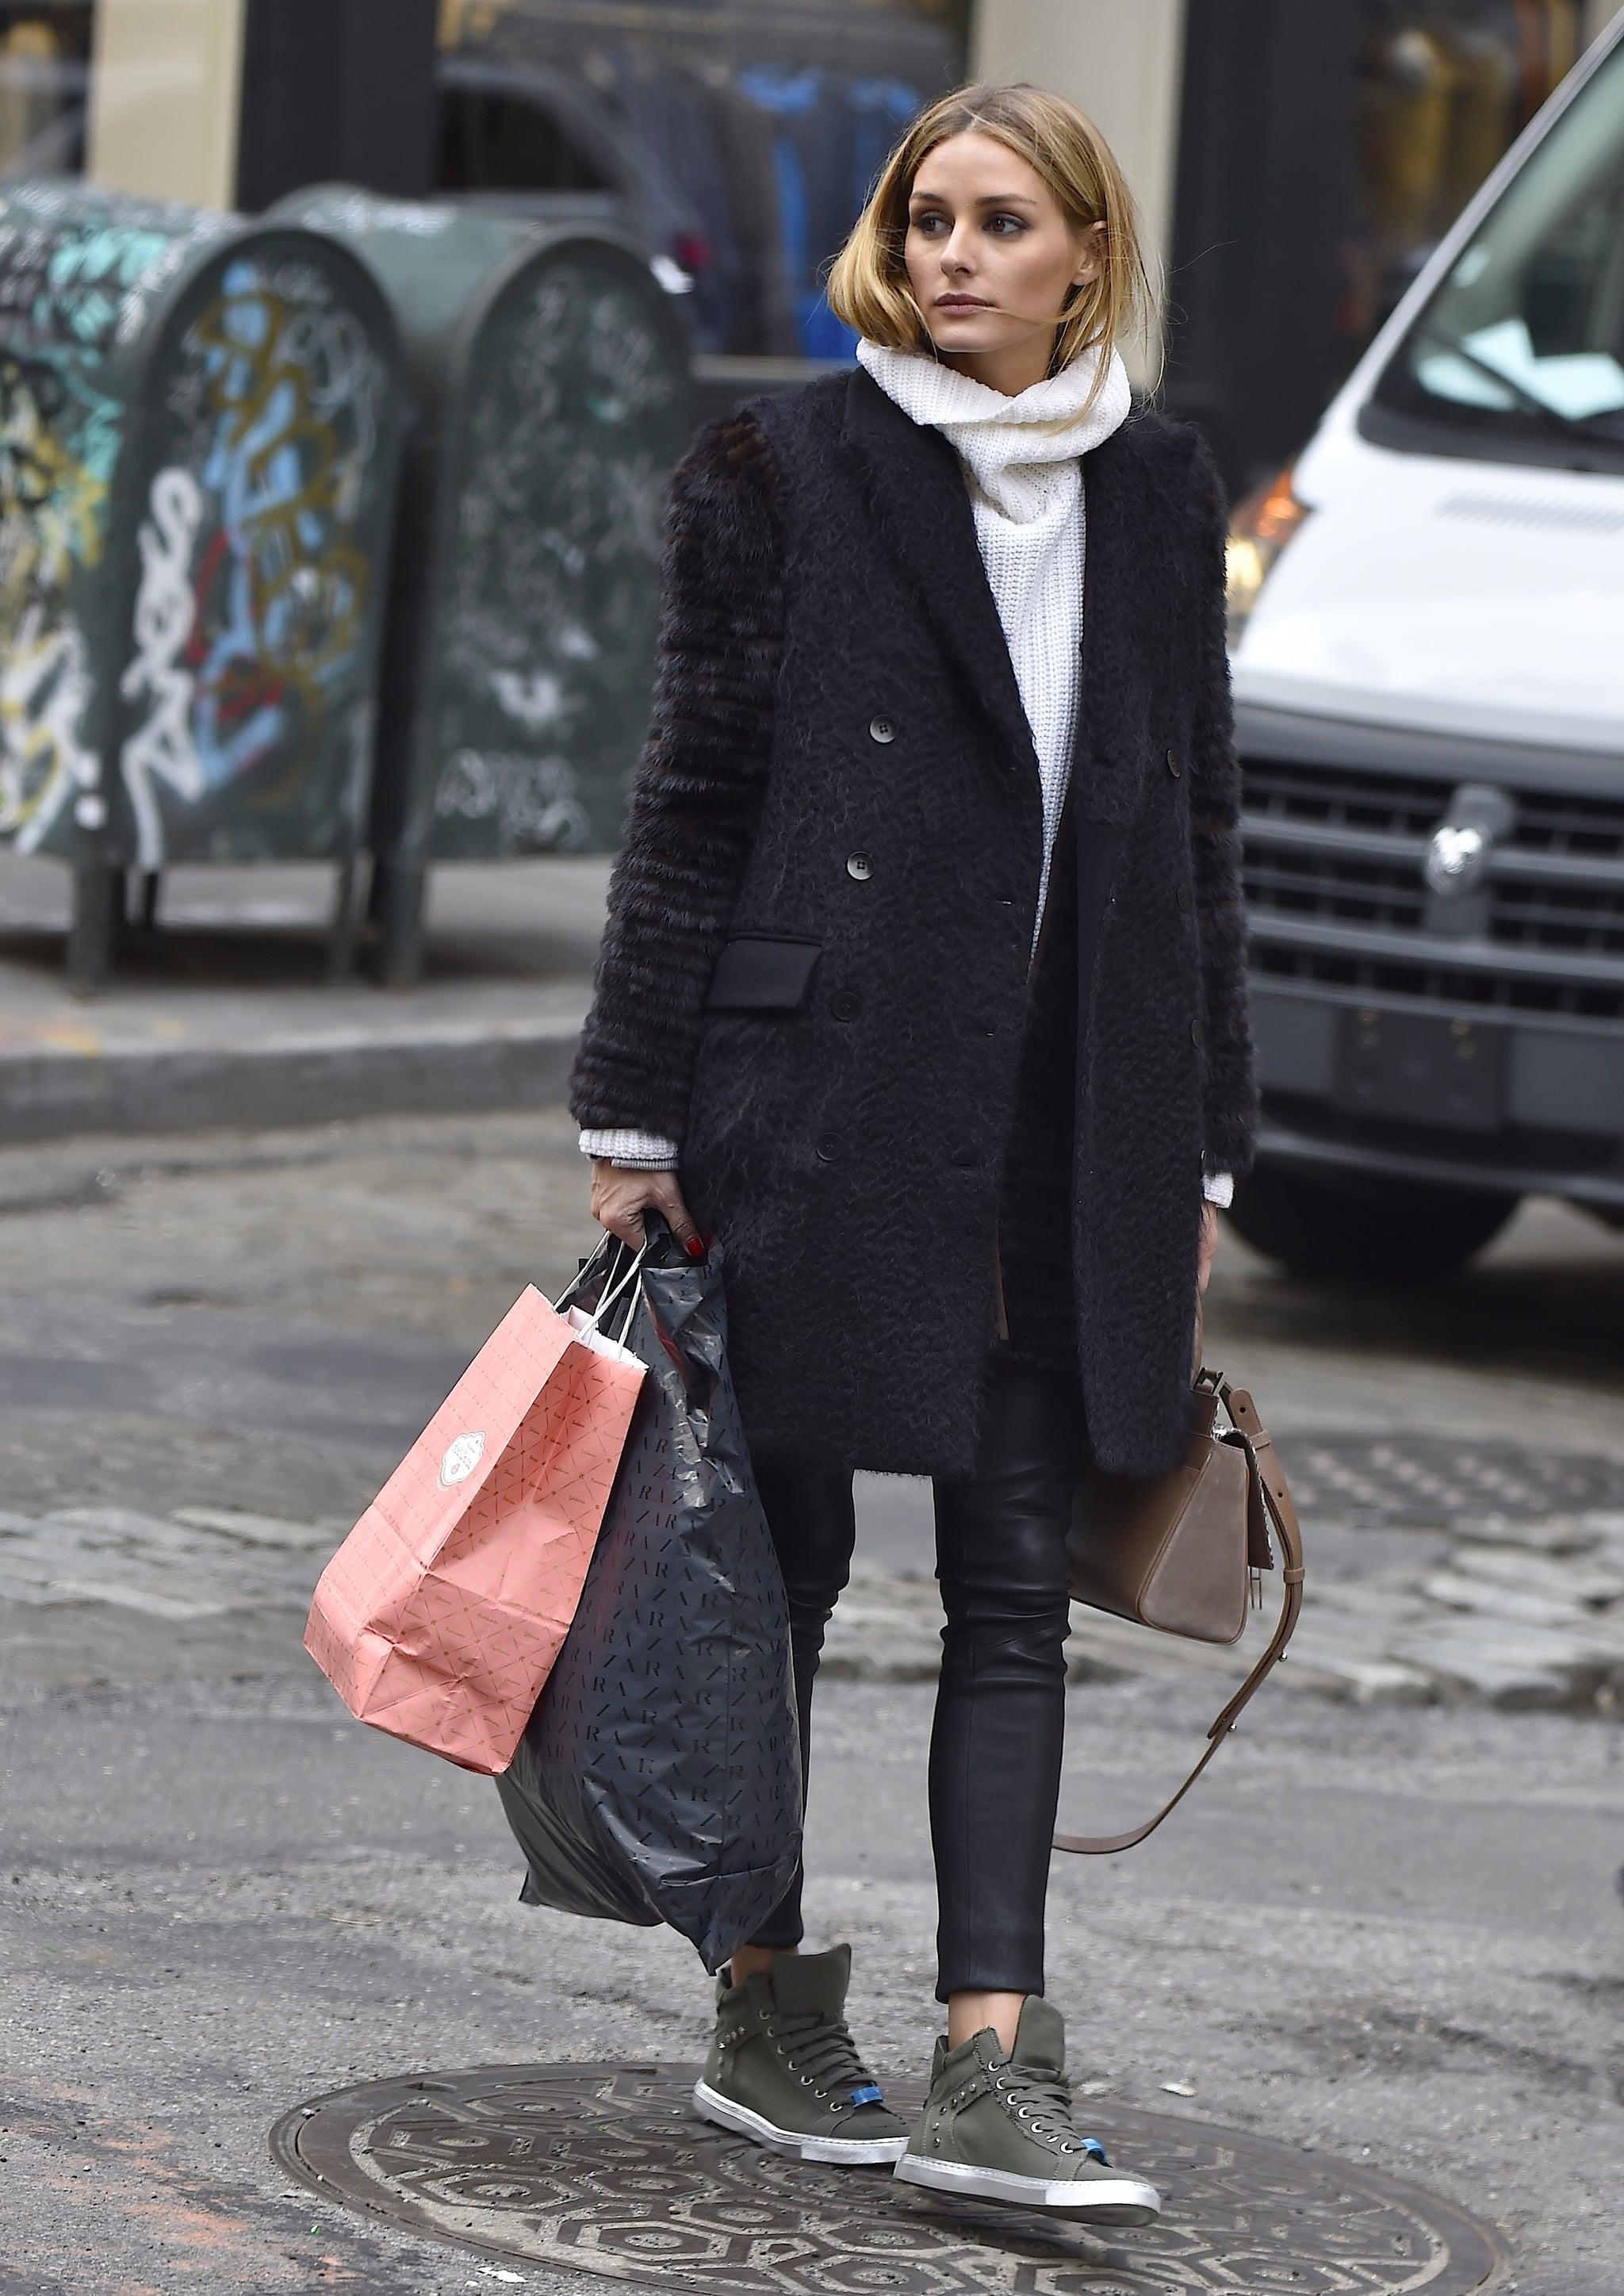 Olivia Palermo Slip On Sneakers   Who